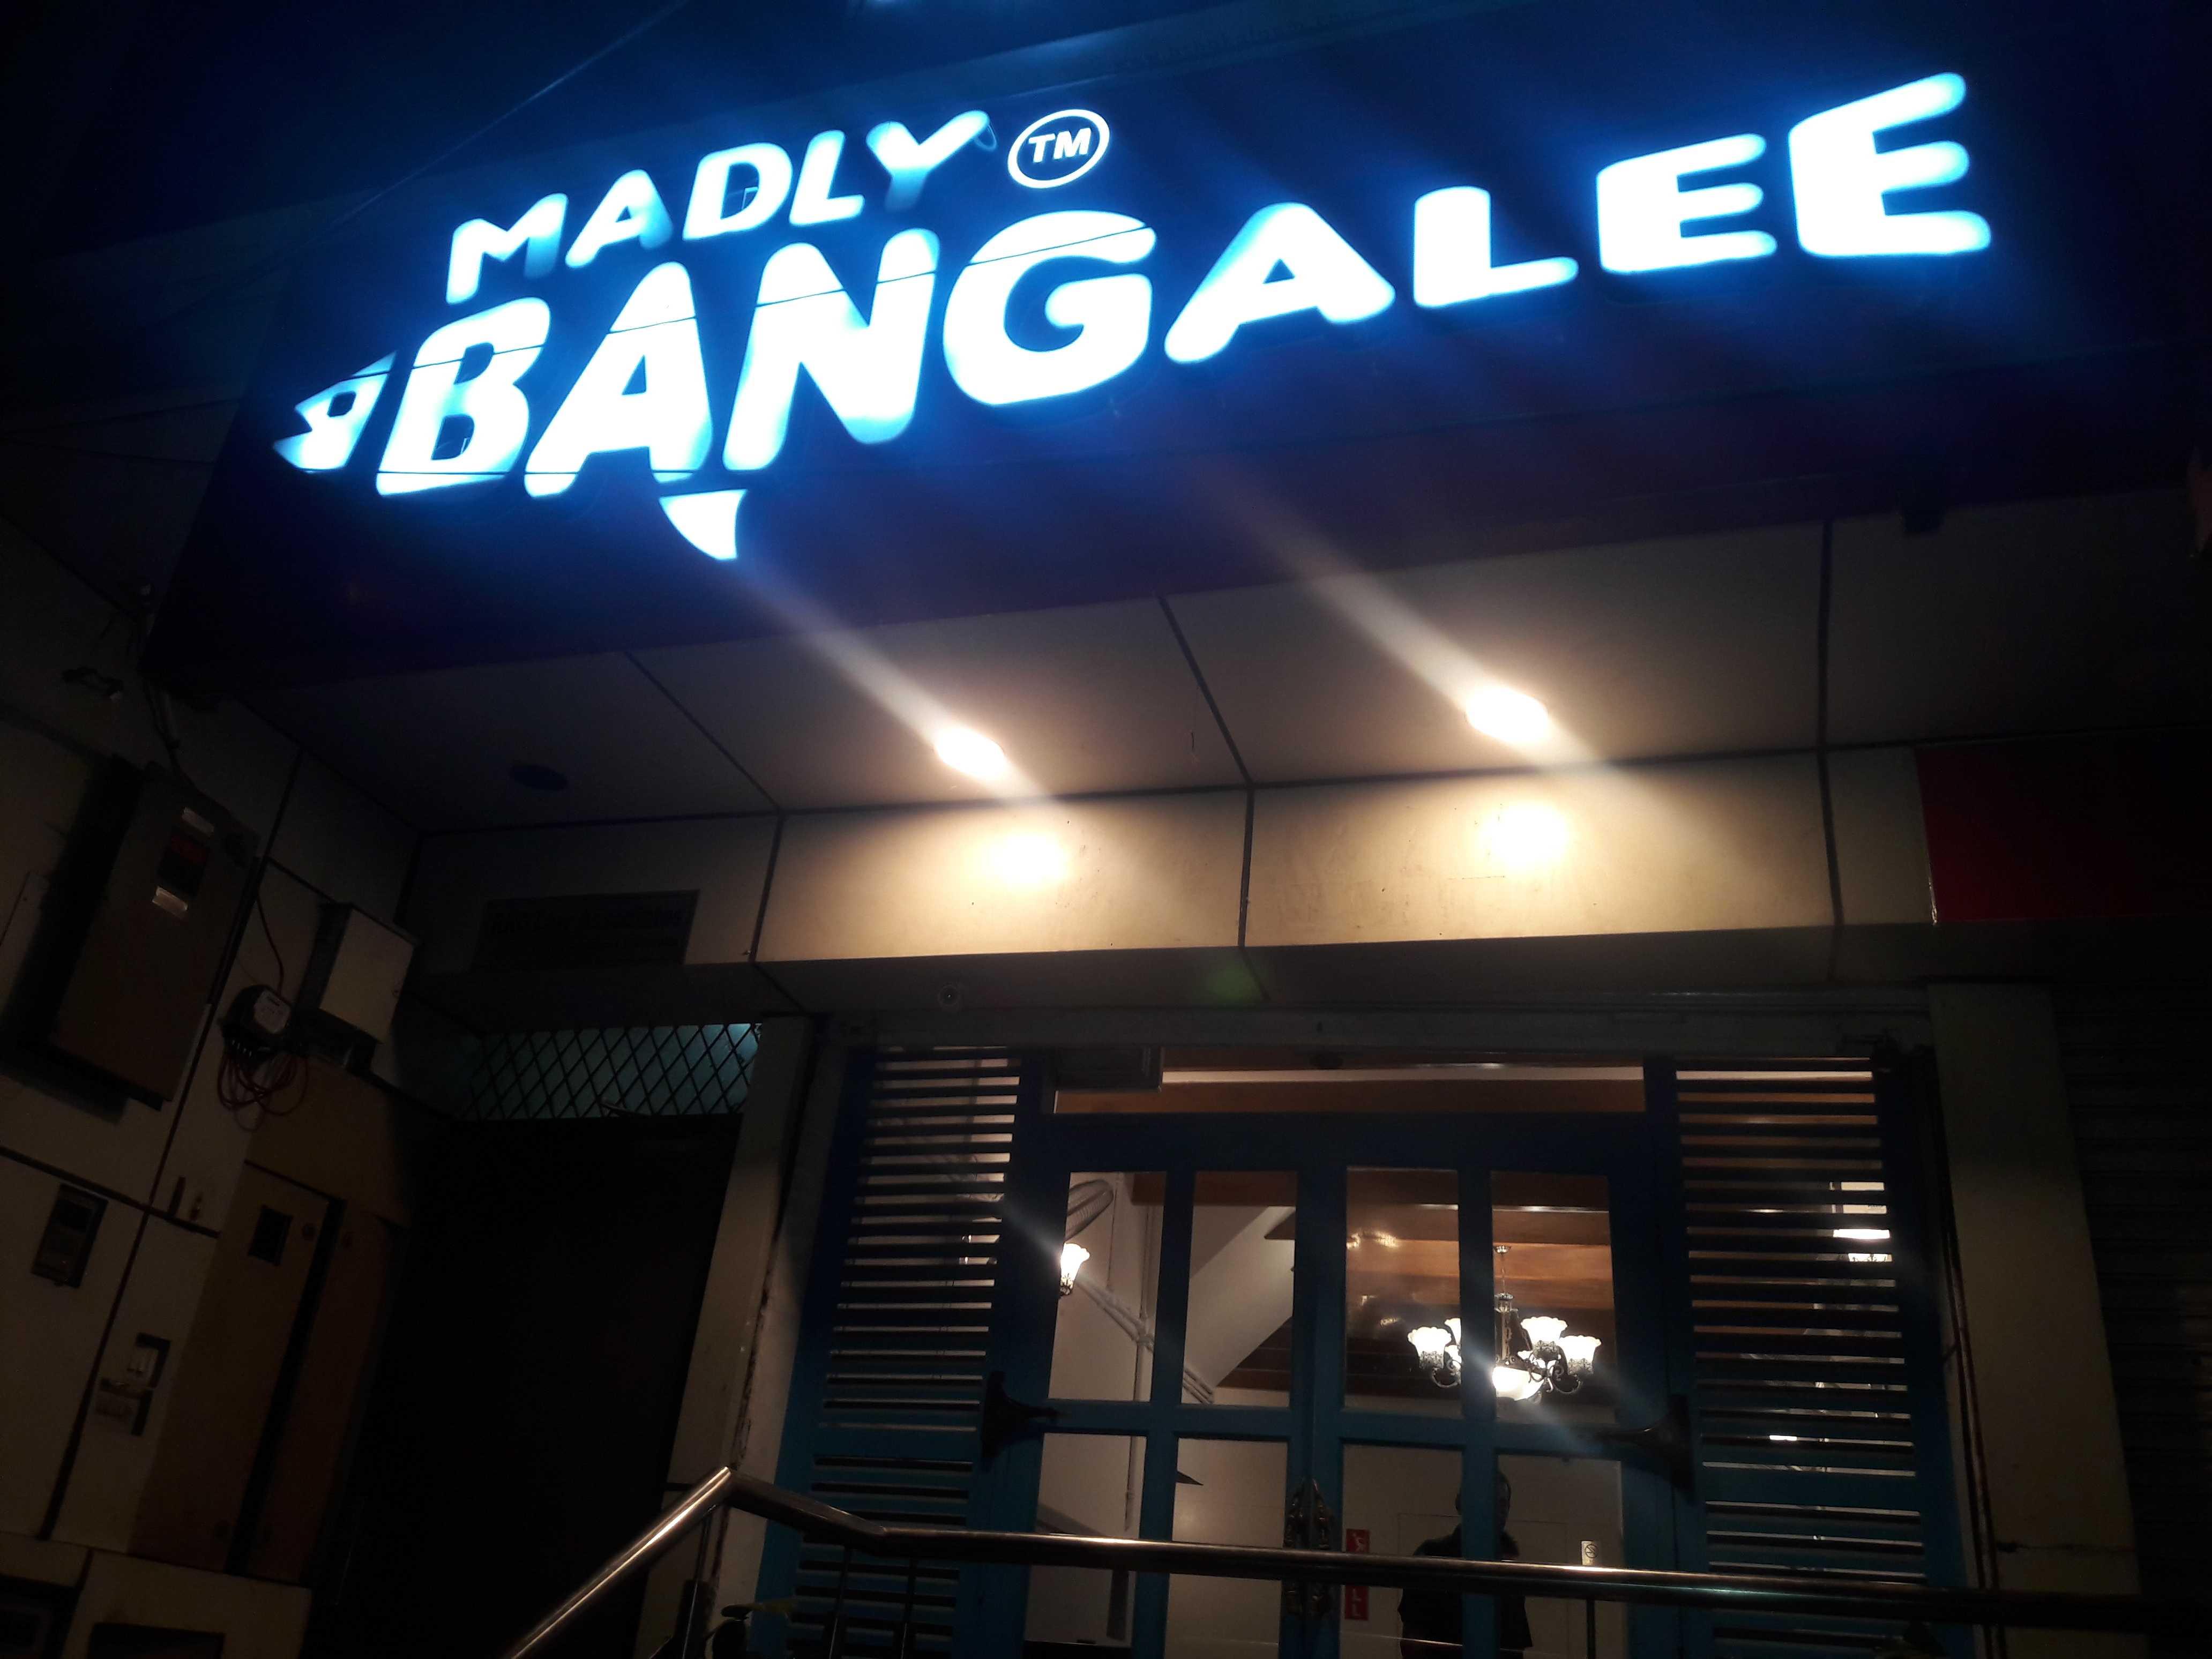 Madly Bangalee-facade-fnbworld-ravi v chhabra